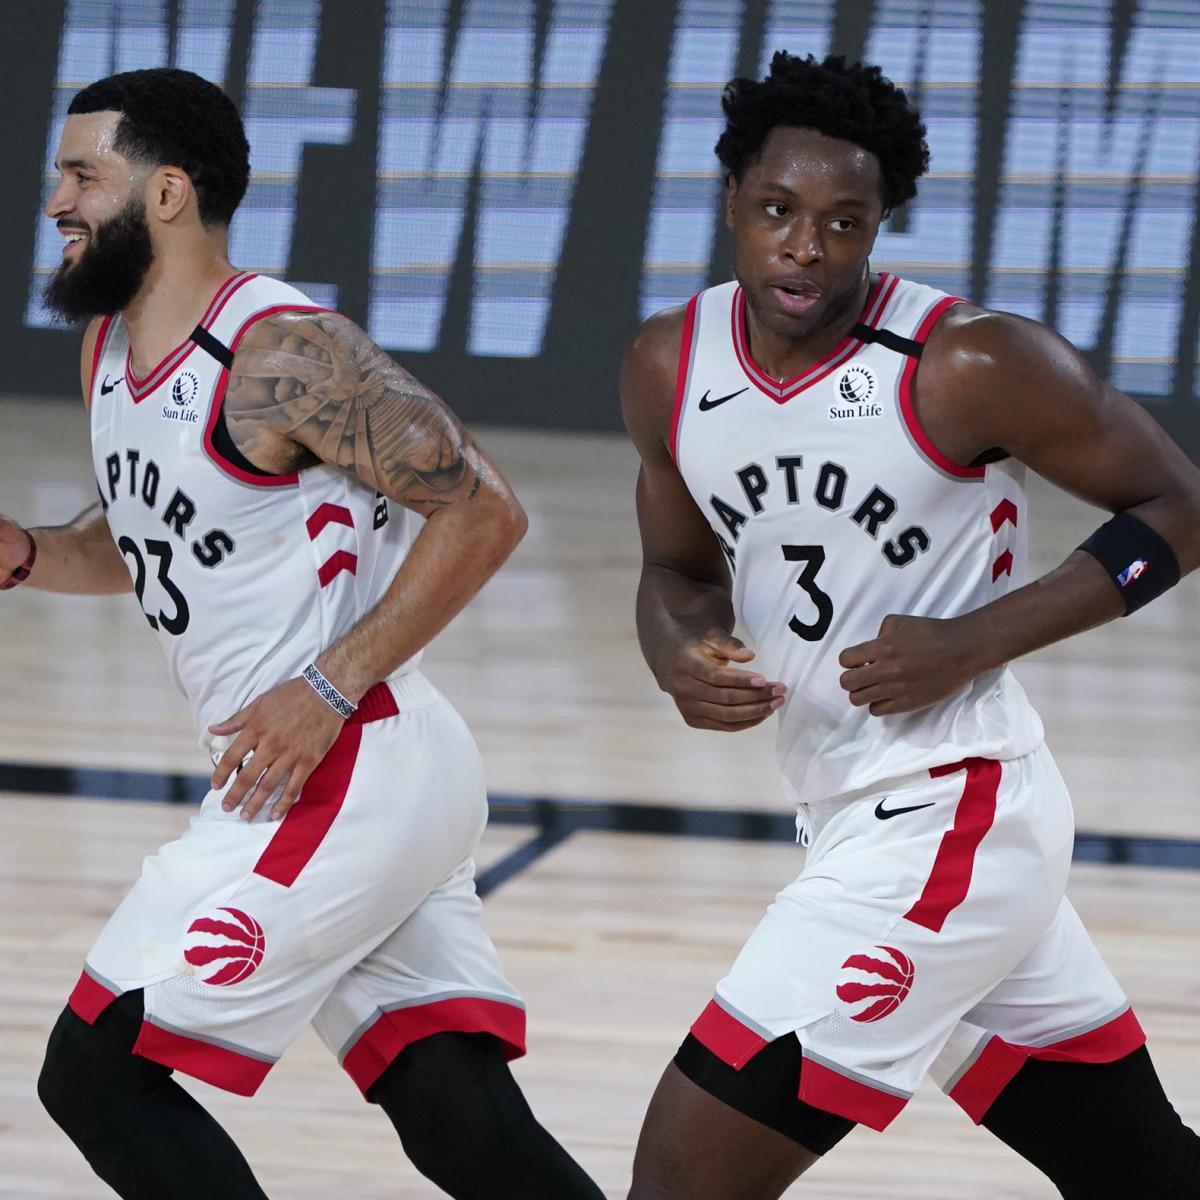 NBA Playoff Standings 2020: Final Regular-Season Records, Seedings and Bracket